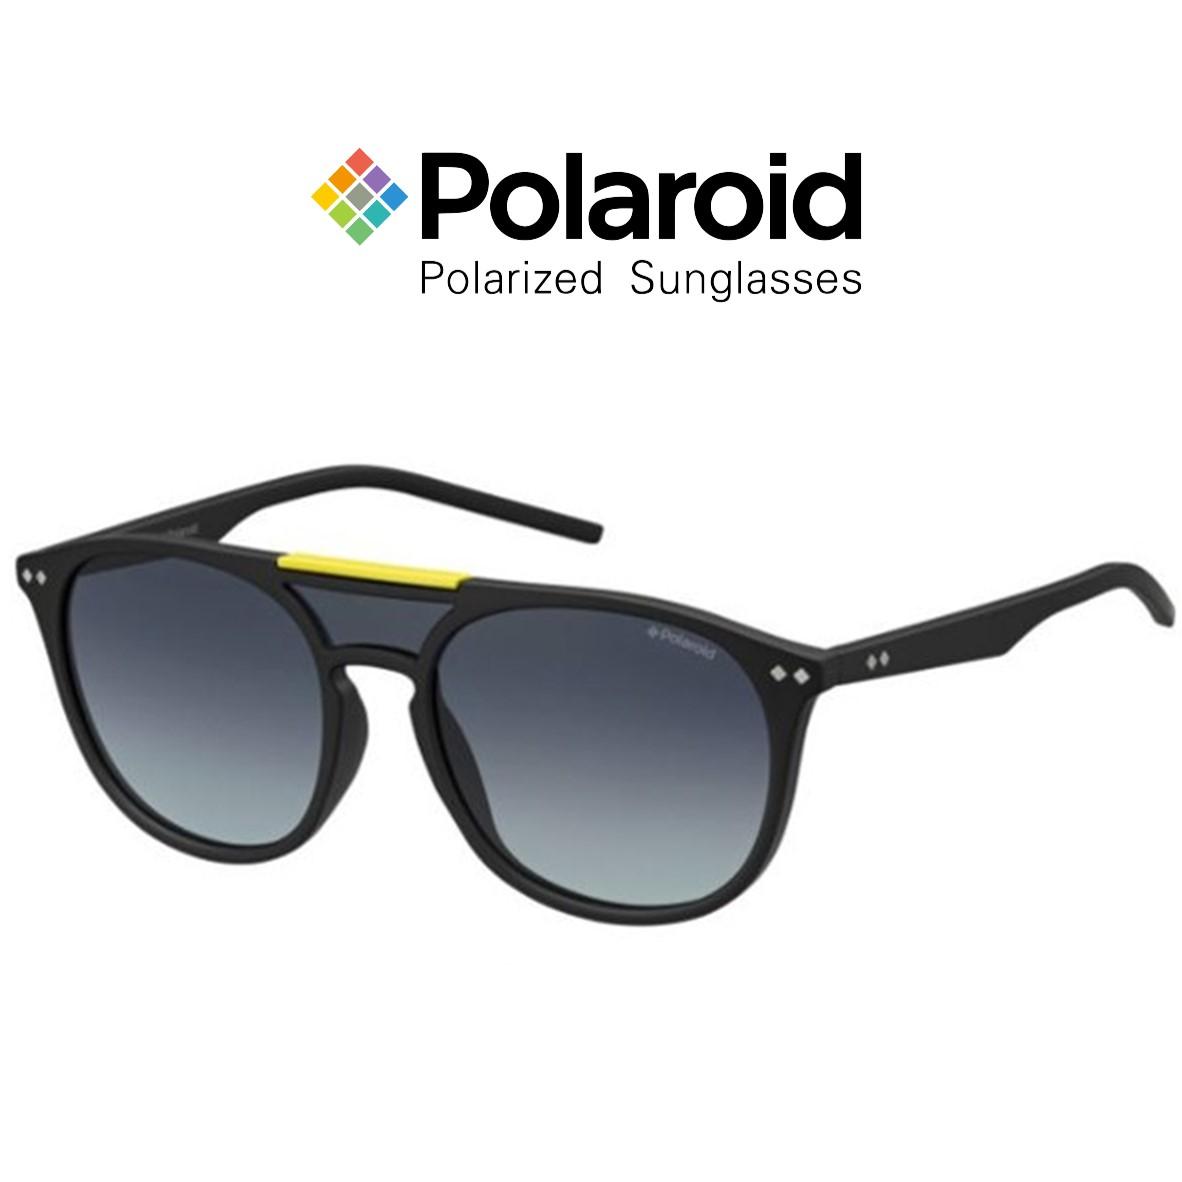 68a03c253cffa Polaroid® Polarized Sunglasses PLD 6023 S DL5 WJ - You Like It